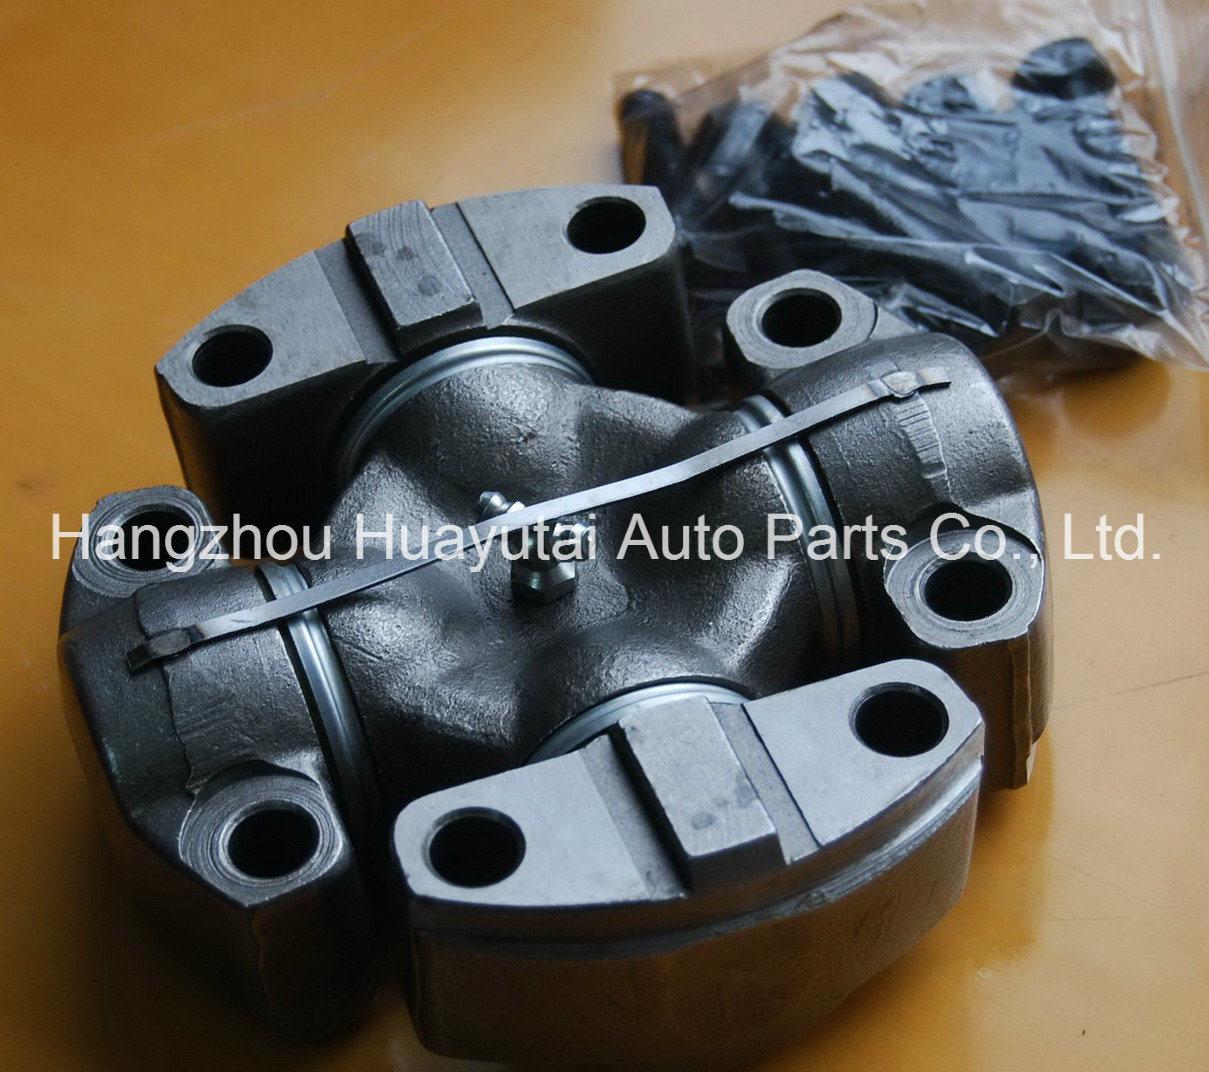 Neapco 2-6600 Universal Joint U